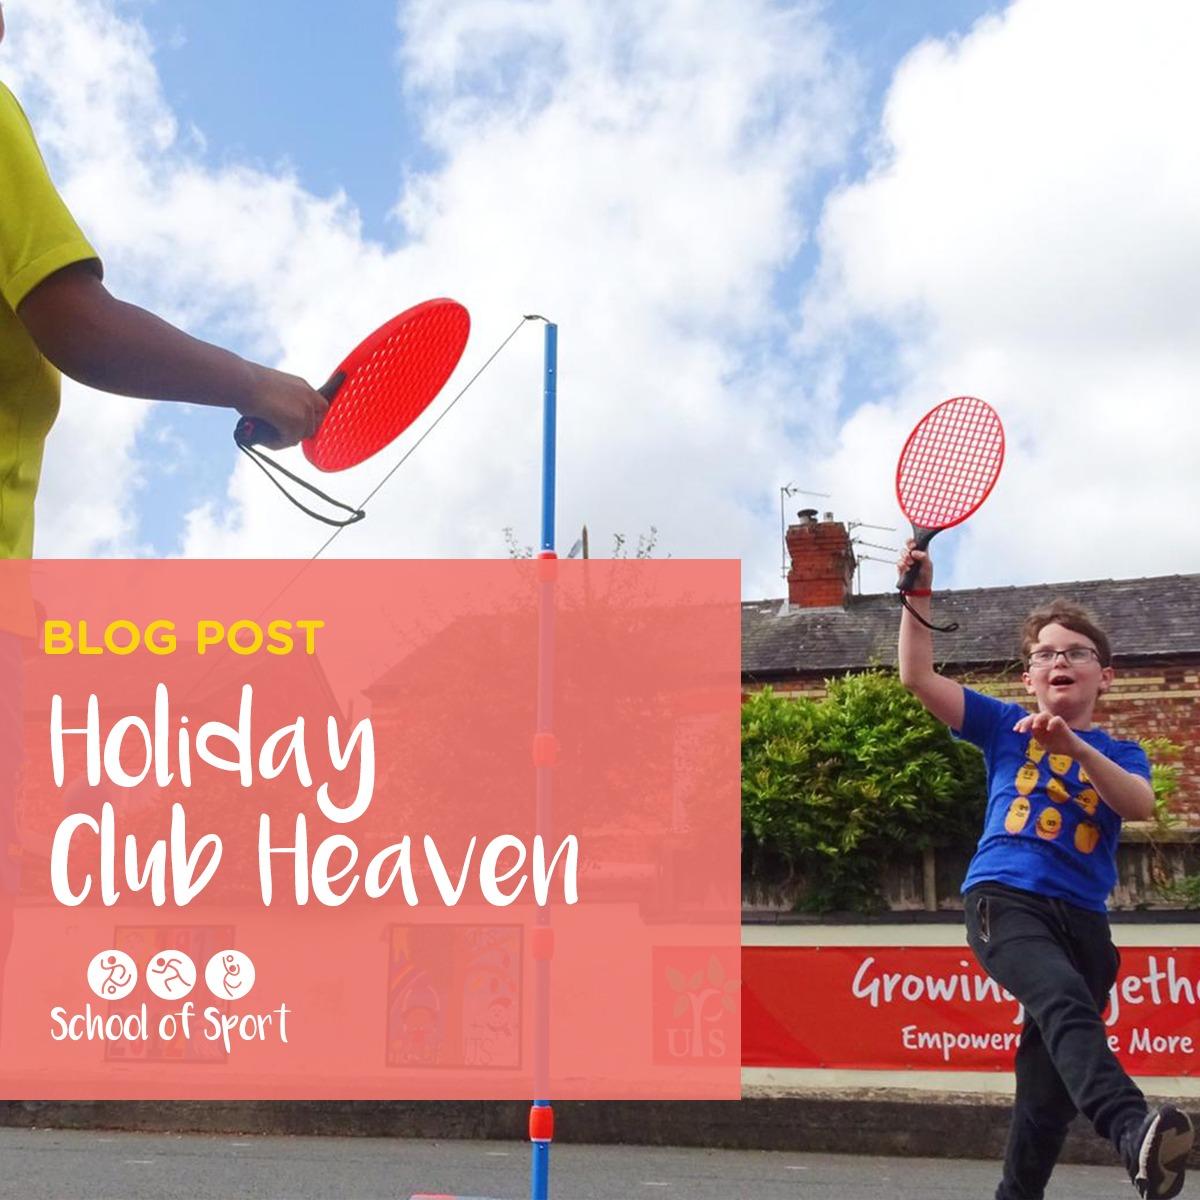 Holiday Club Heaven!